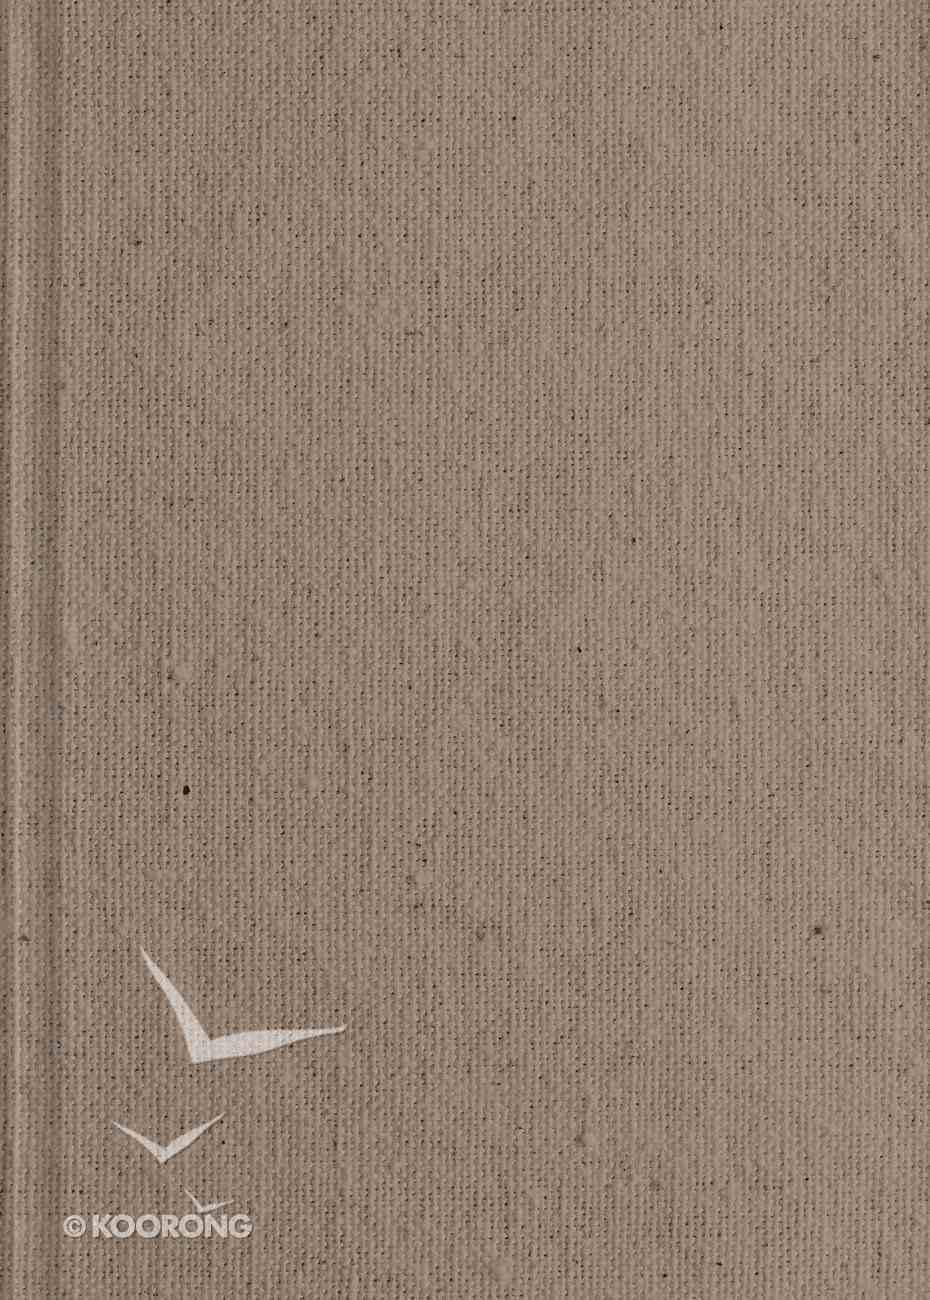 ESV Macarthur Study Bible Tan (Black Letter Edition) Hardback